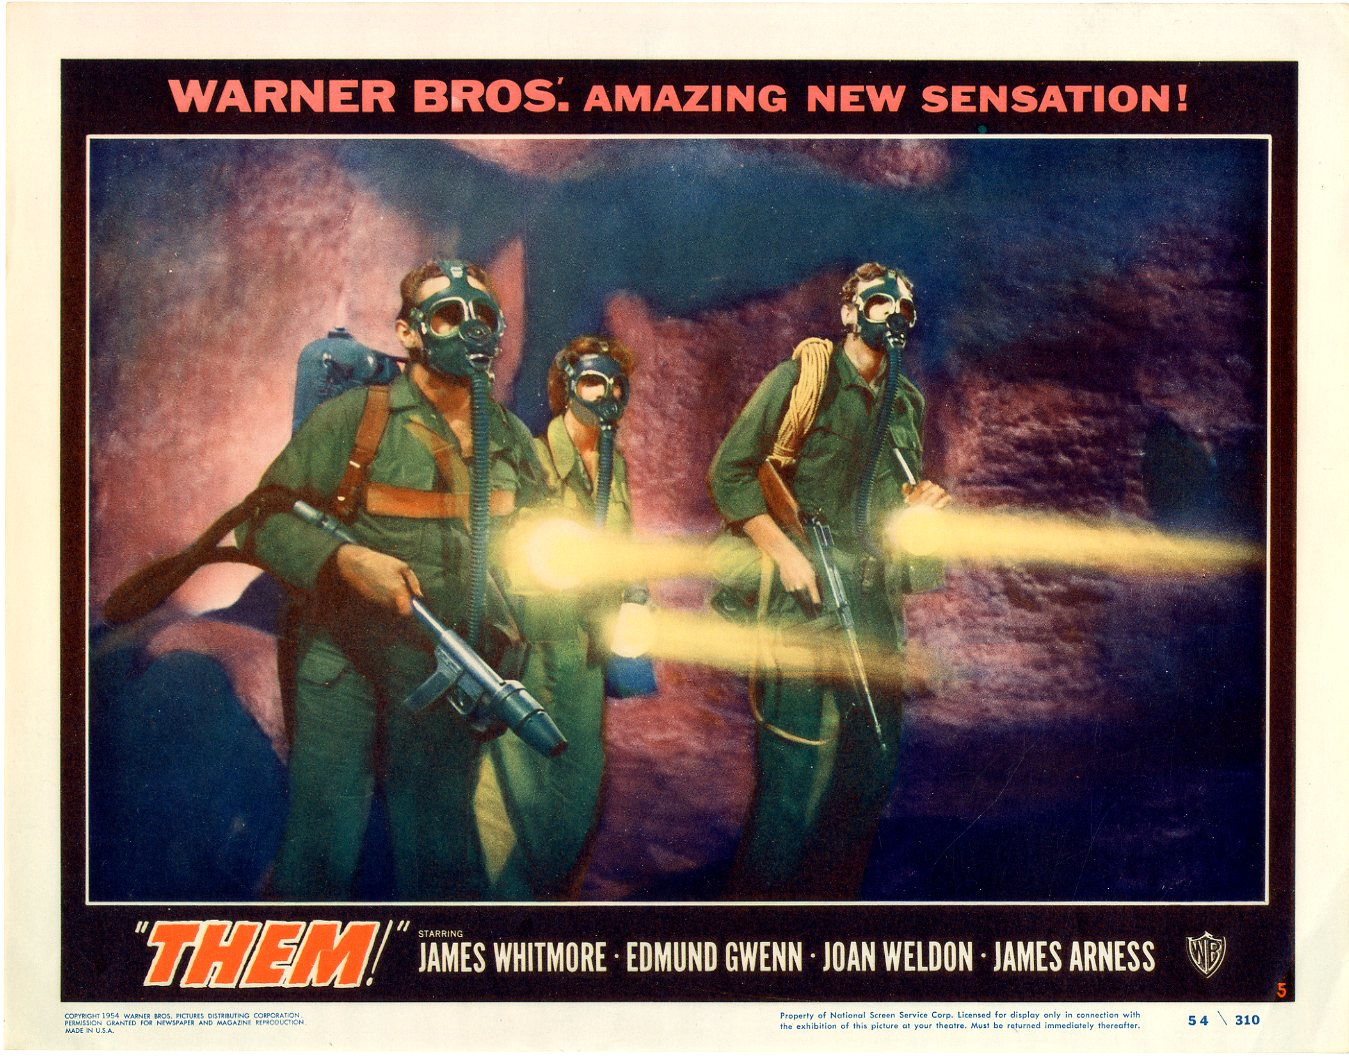 По следам «Fallout» №2: научно-фантастический фильм «Они!» / «Them!» (1954)  - Изображение 4